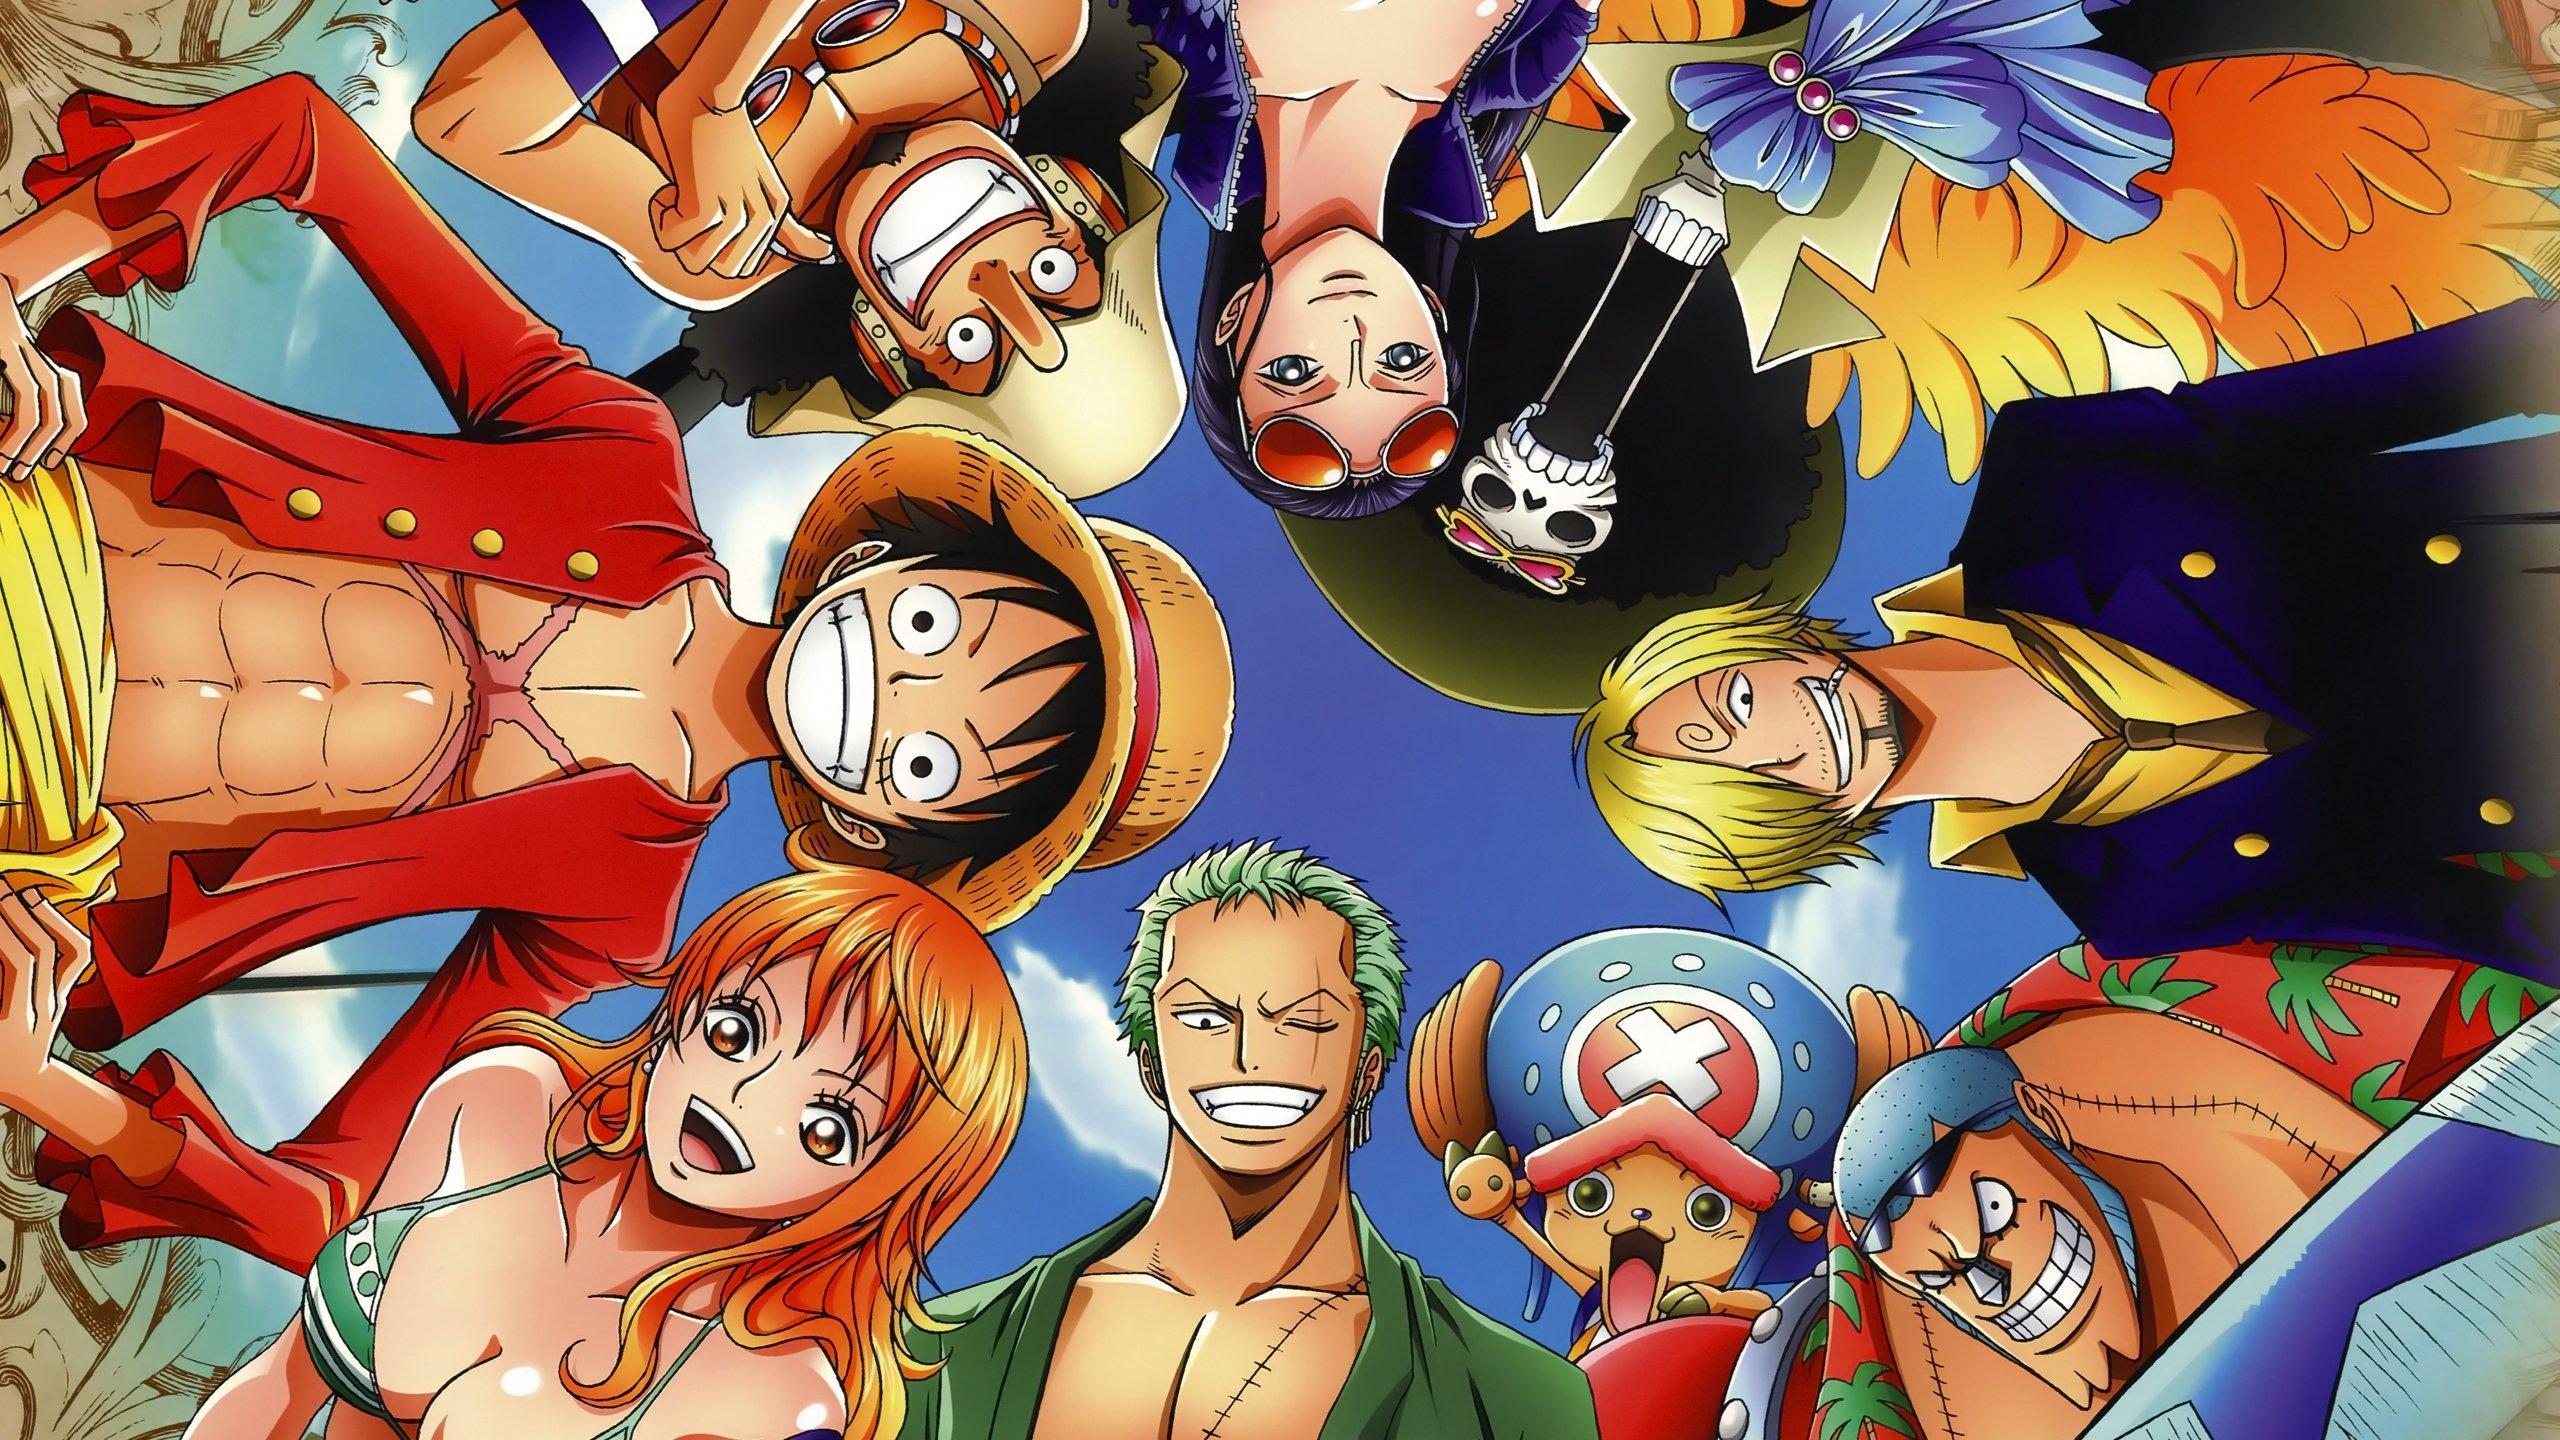 Fondos de pantalla Anime Personajes de Once Piece